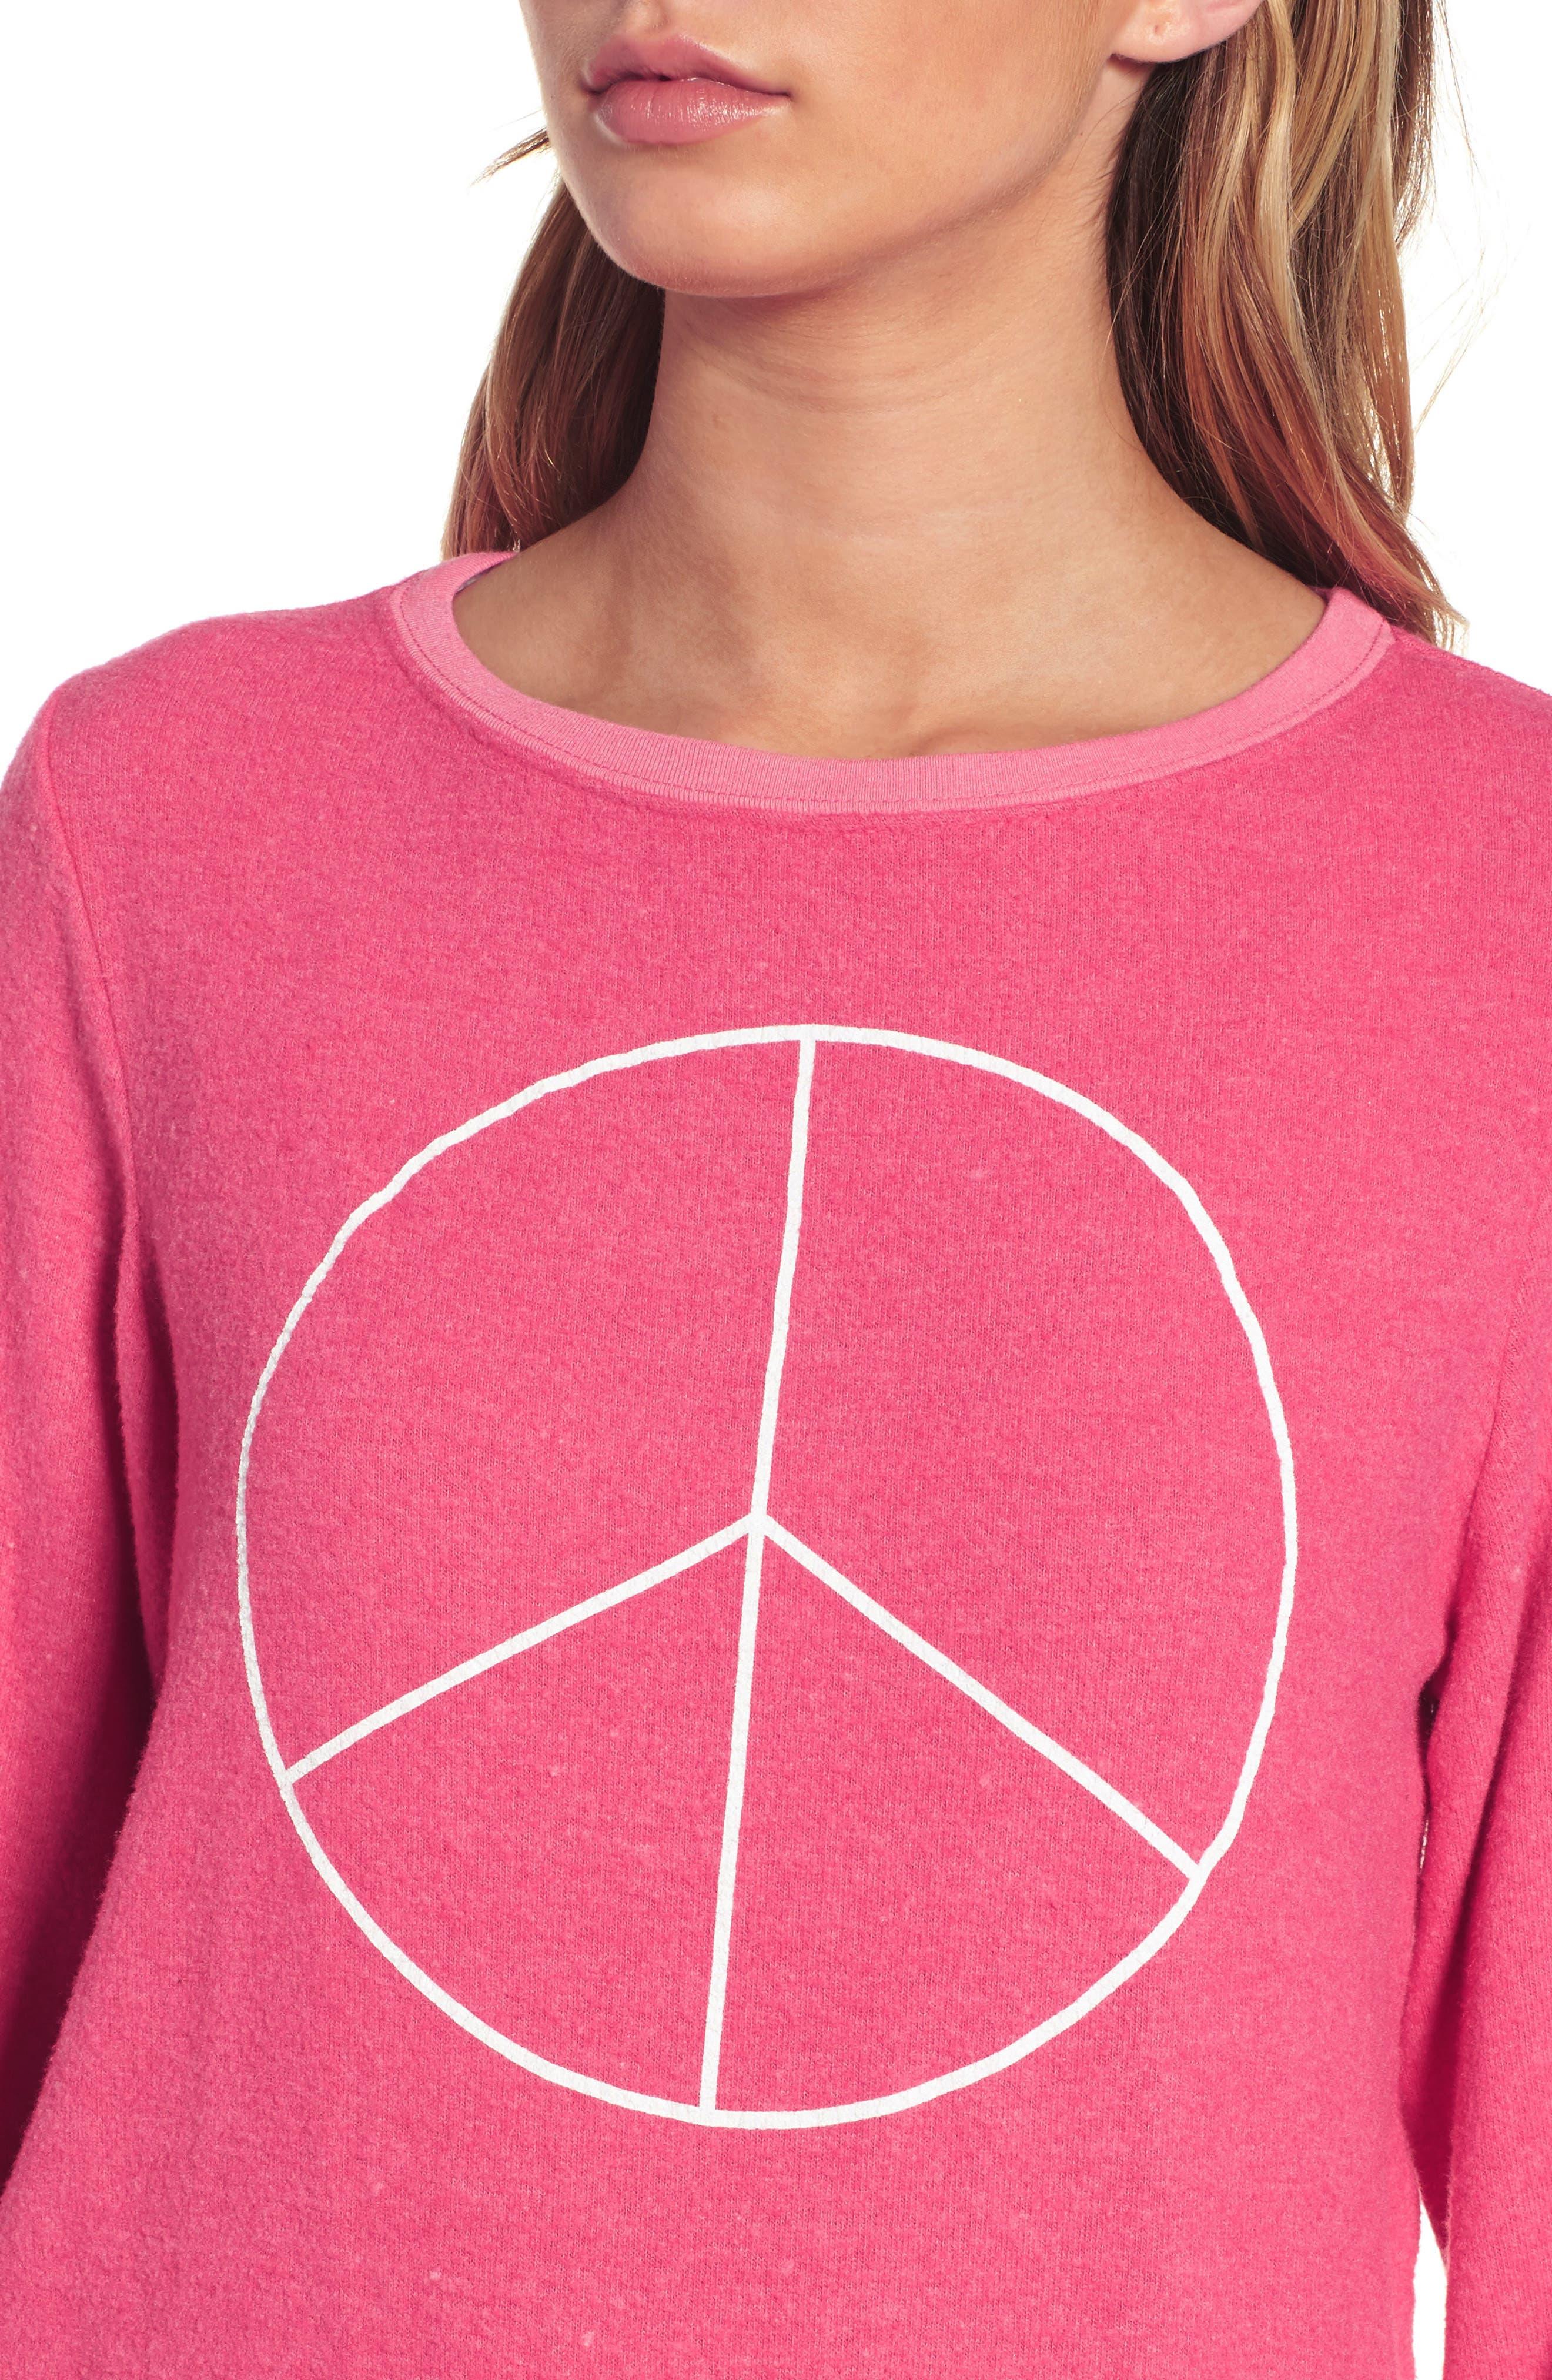 Peace Sweatshirt,                             Alternate thumbnail 4, color,                             670